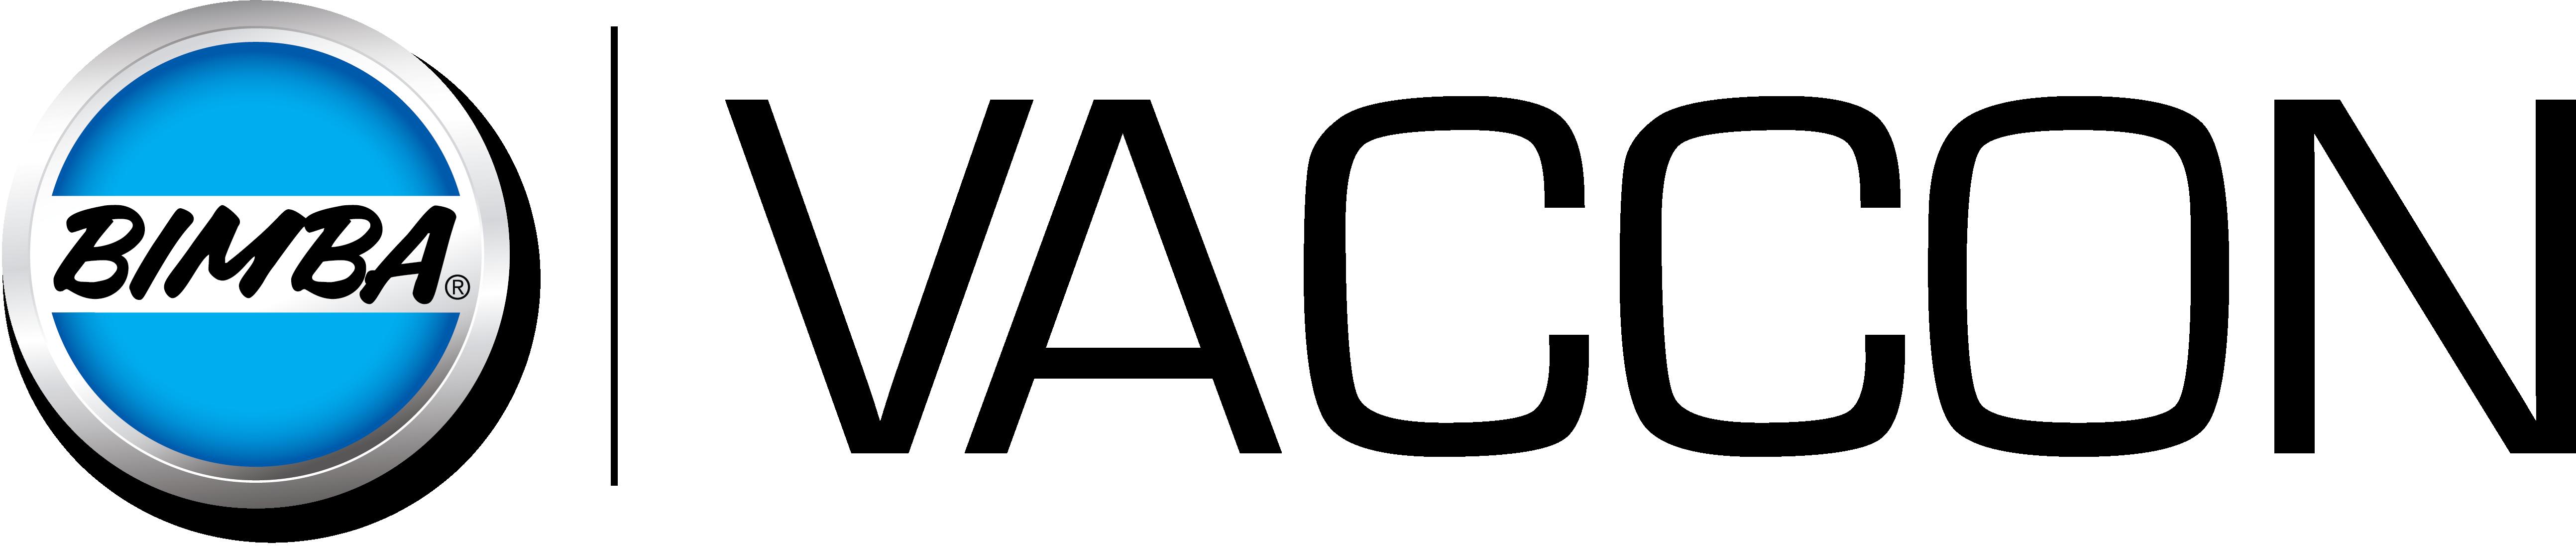 New_Bimba_Dim_4c-logo_VACCON.png